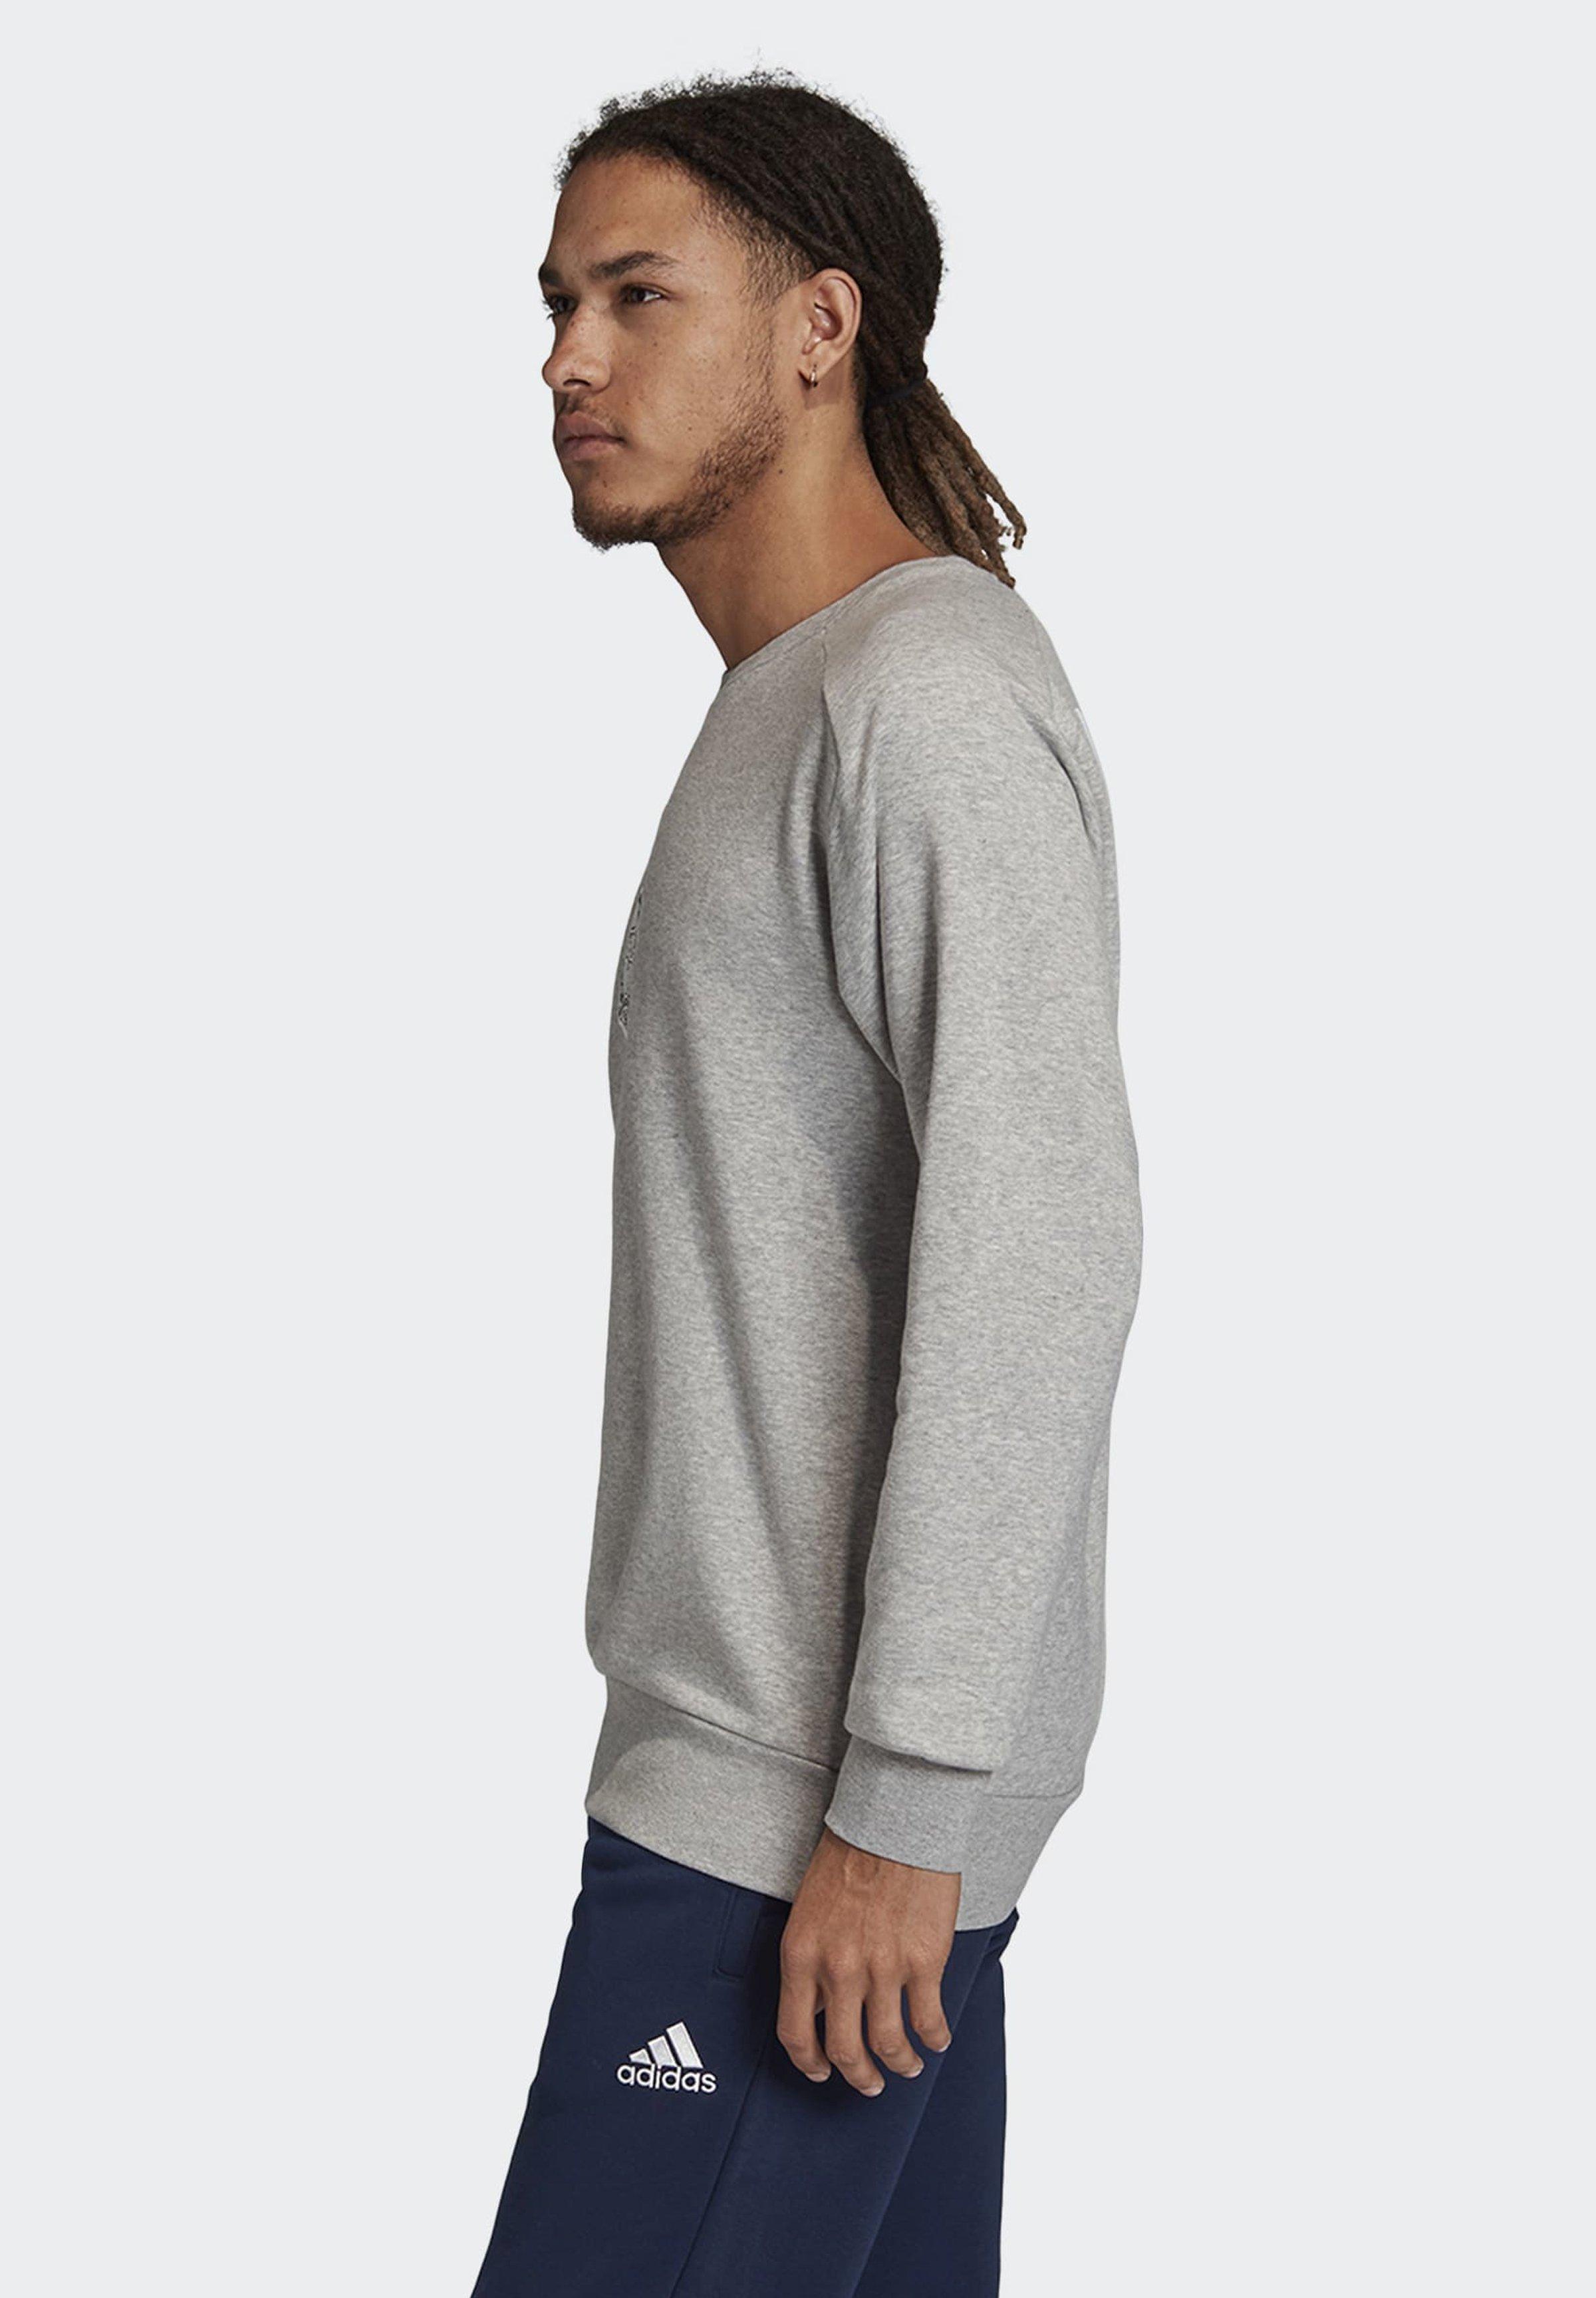 Adidas Performance Spain Seasonal Special Crew Sweatshirt - Grey